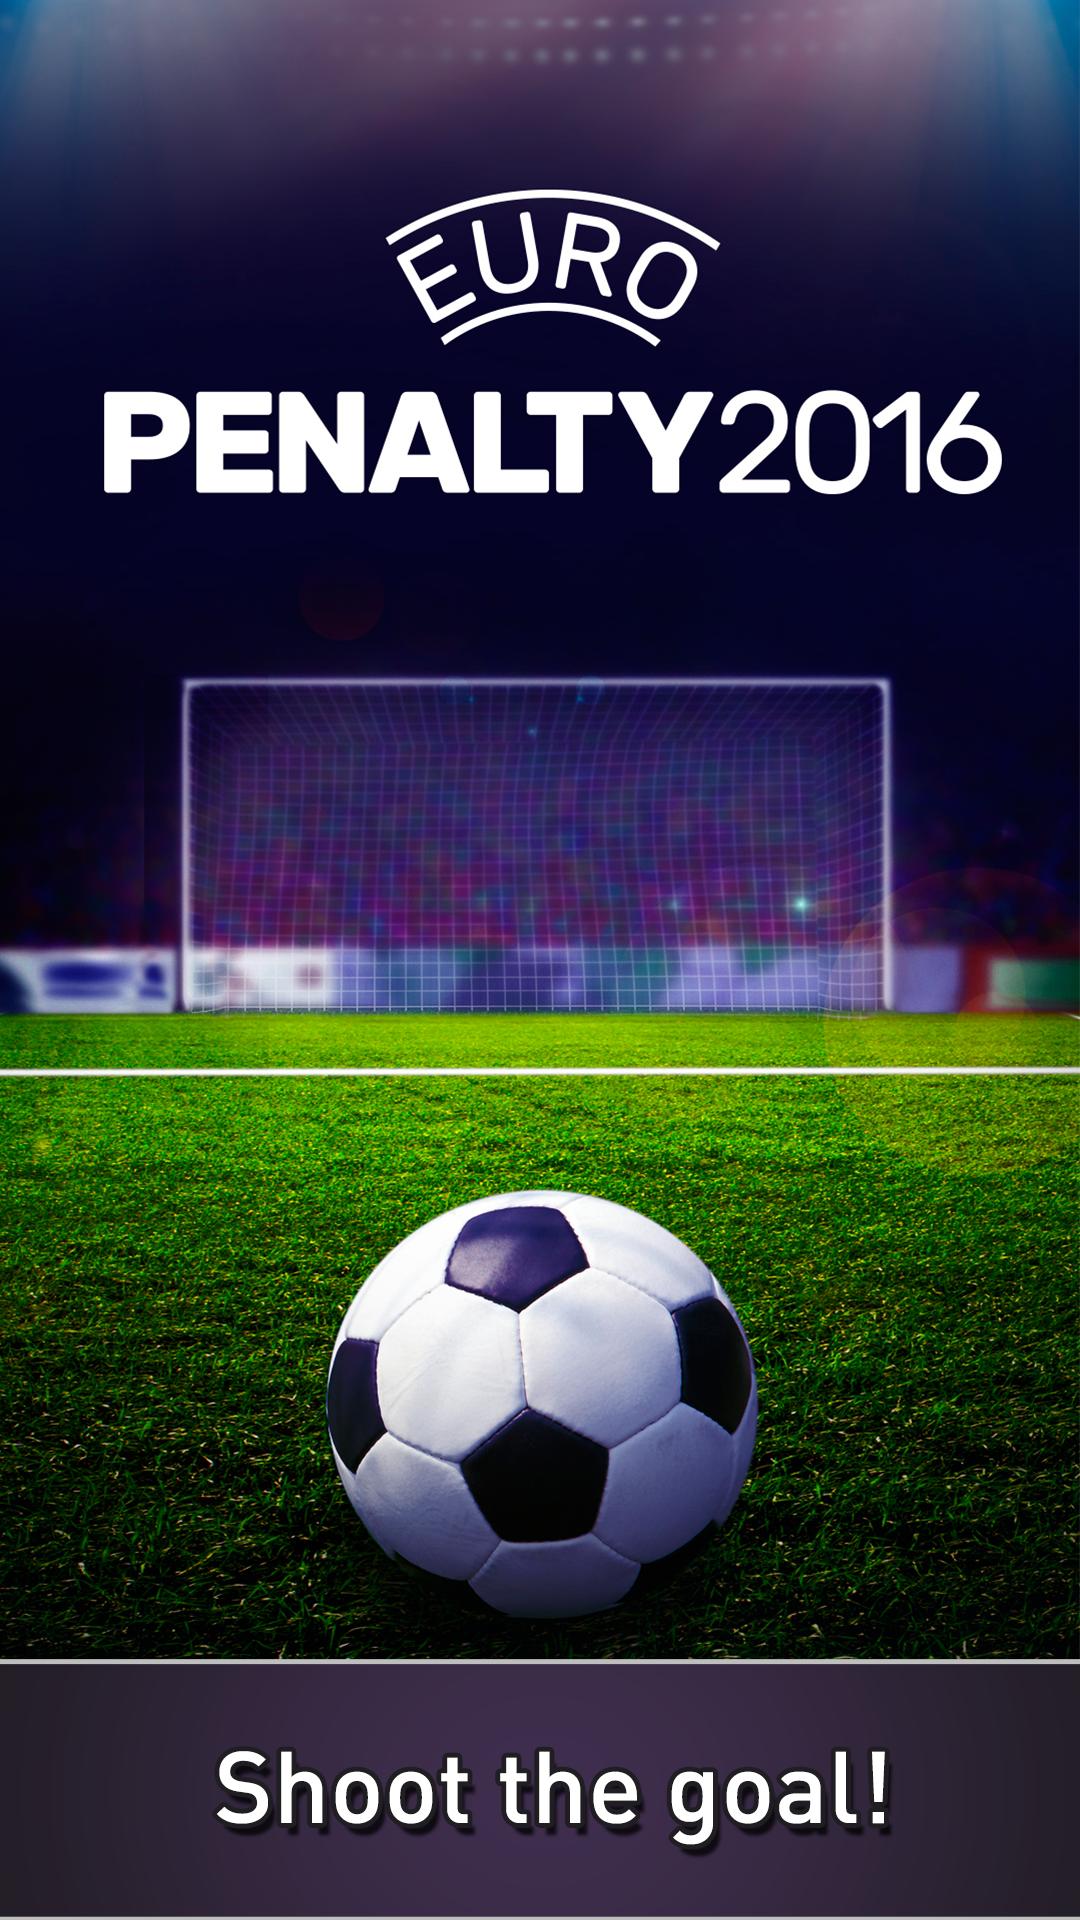 Euro 2016 Football Penalty online